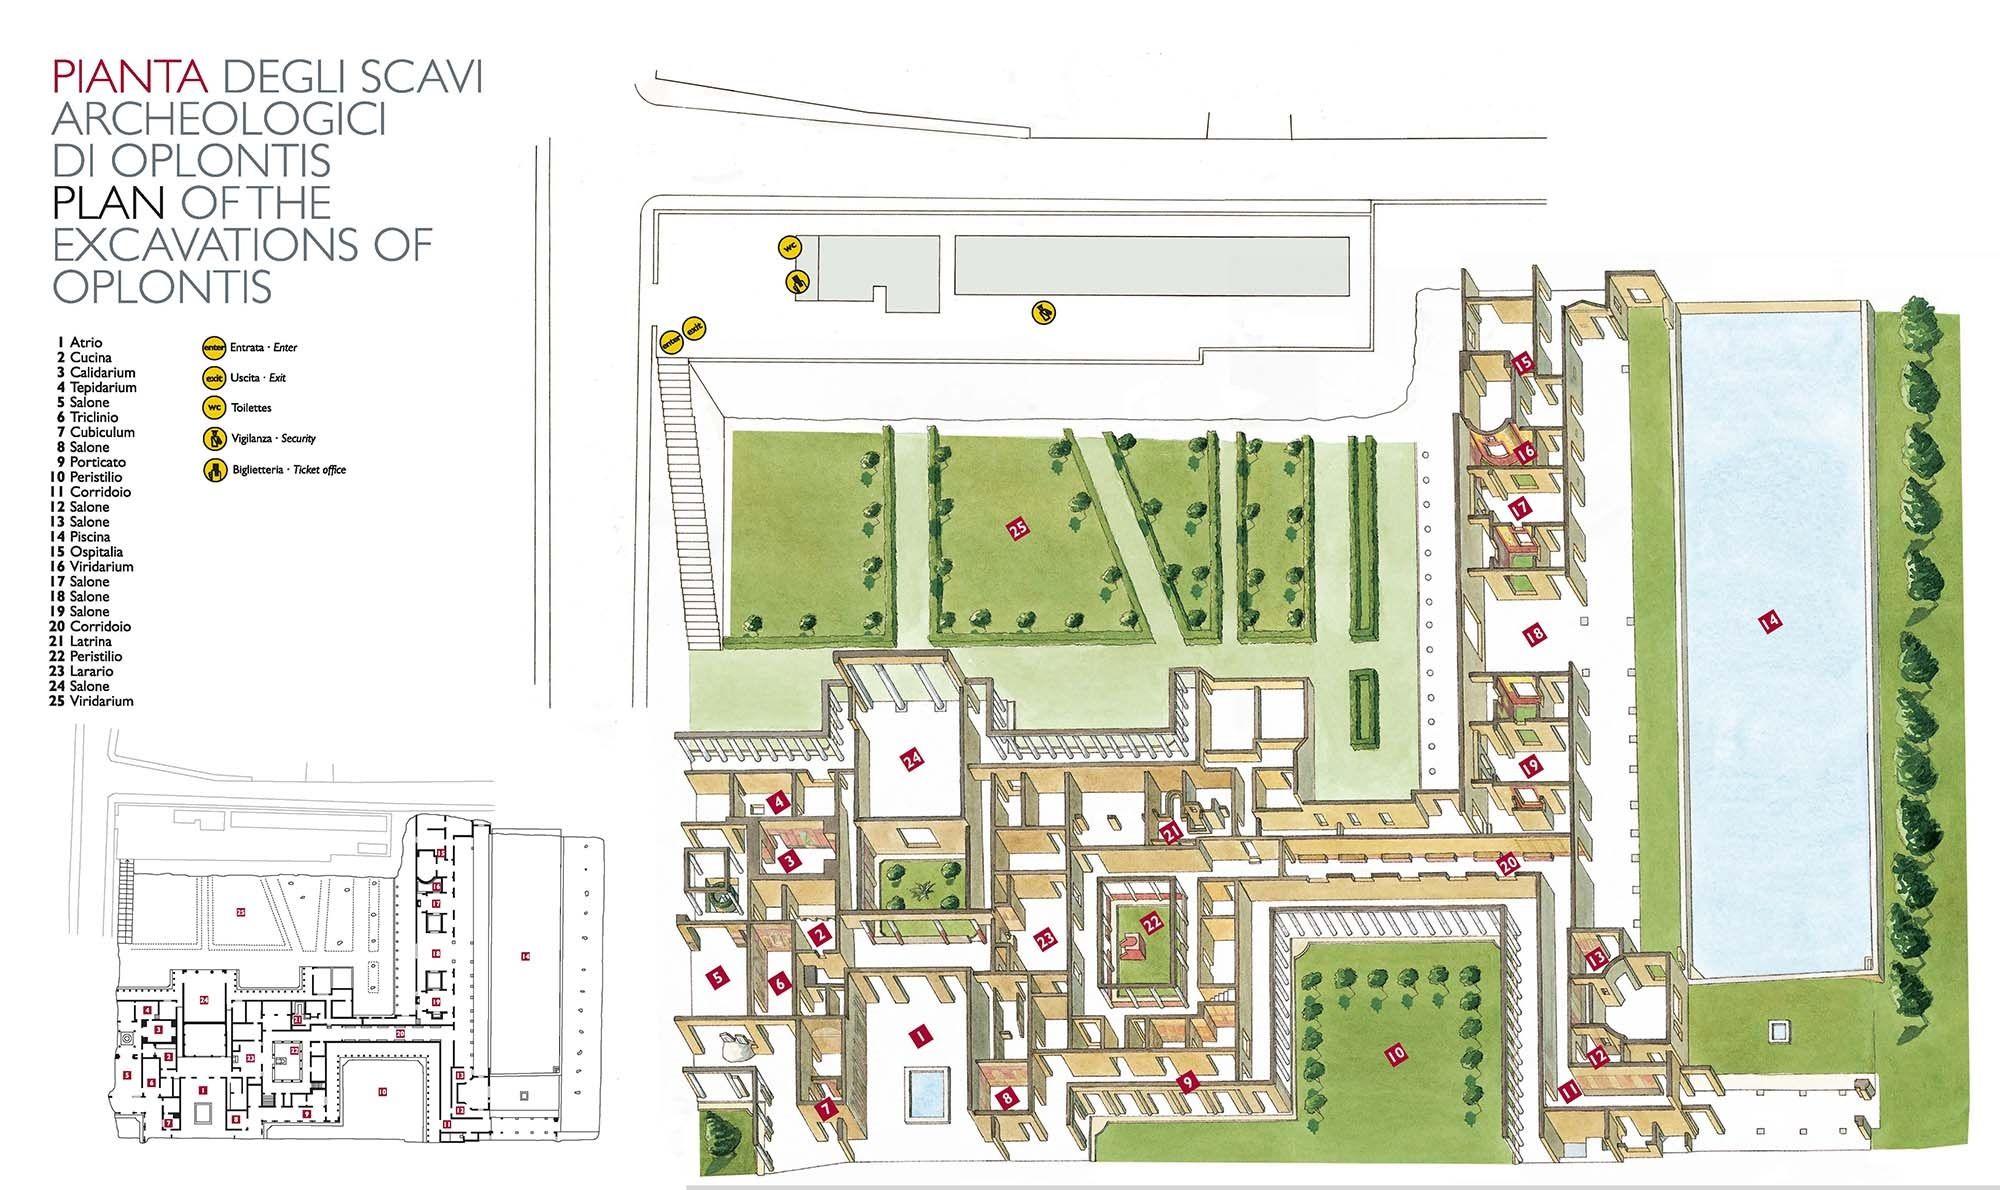 Cast Arredo Torre Annunziata plan of the villa di poppea in oplontis (the modern torre